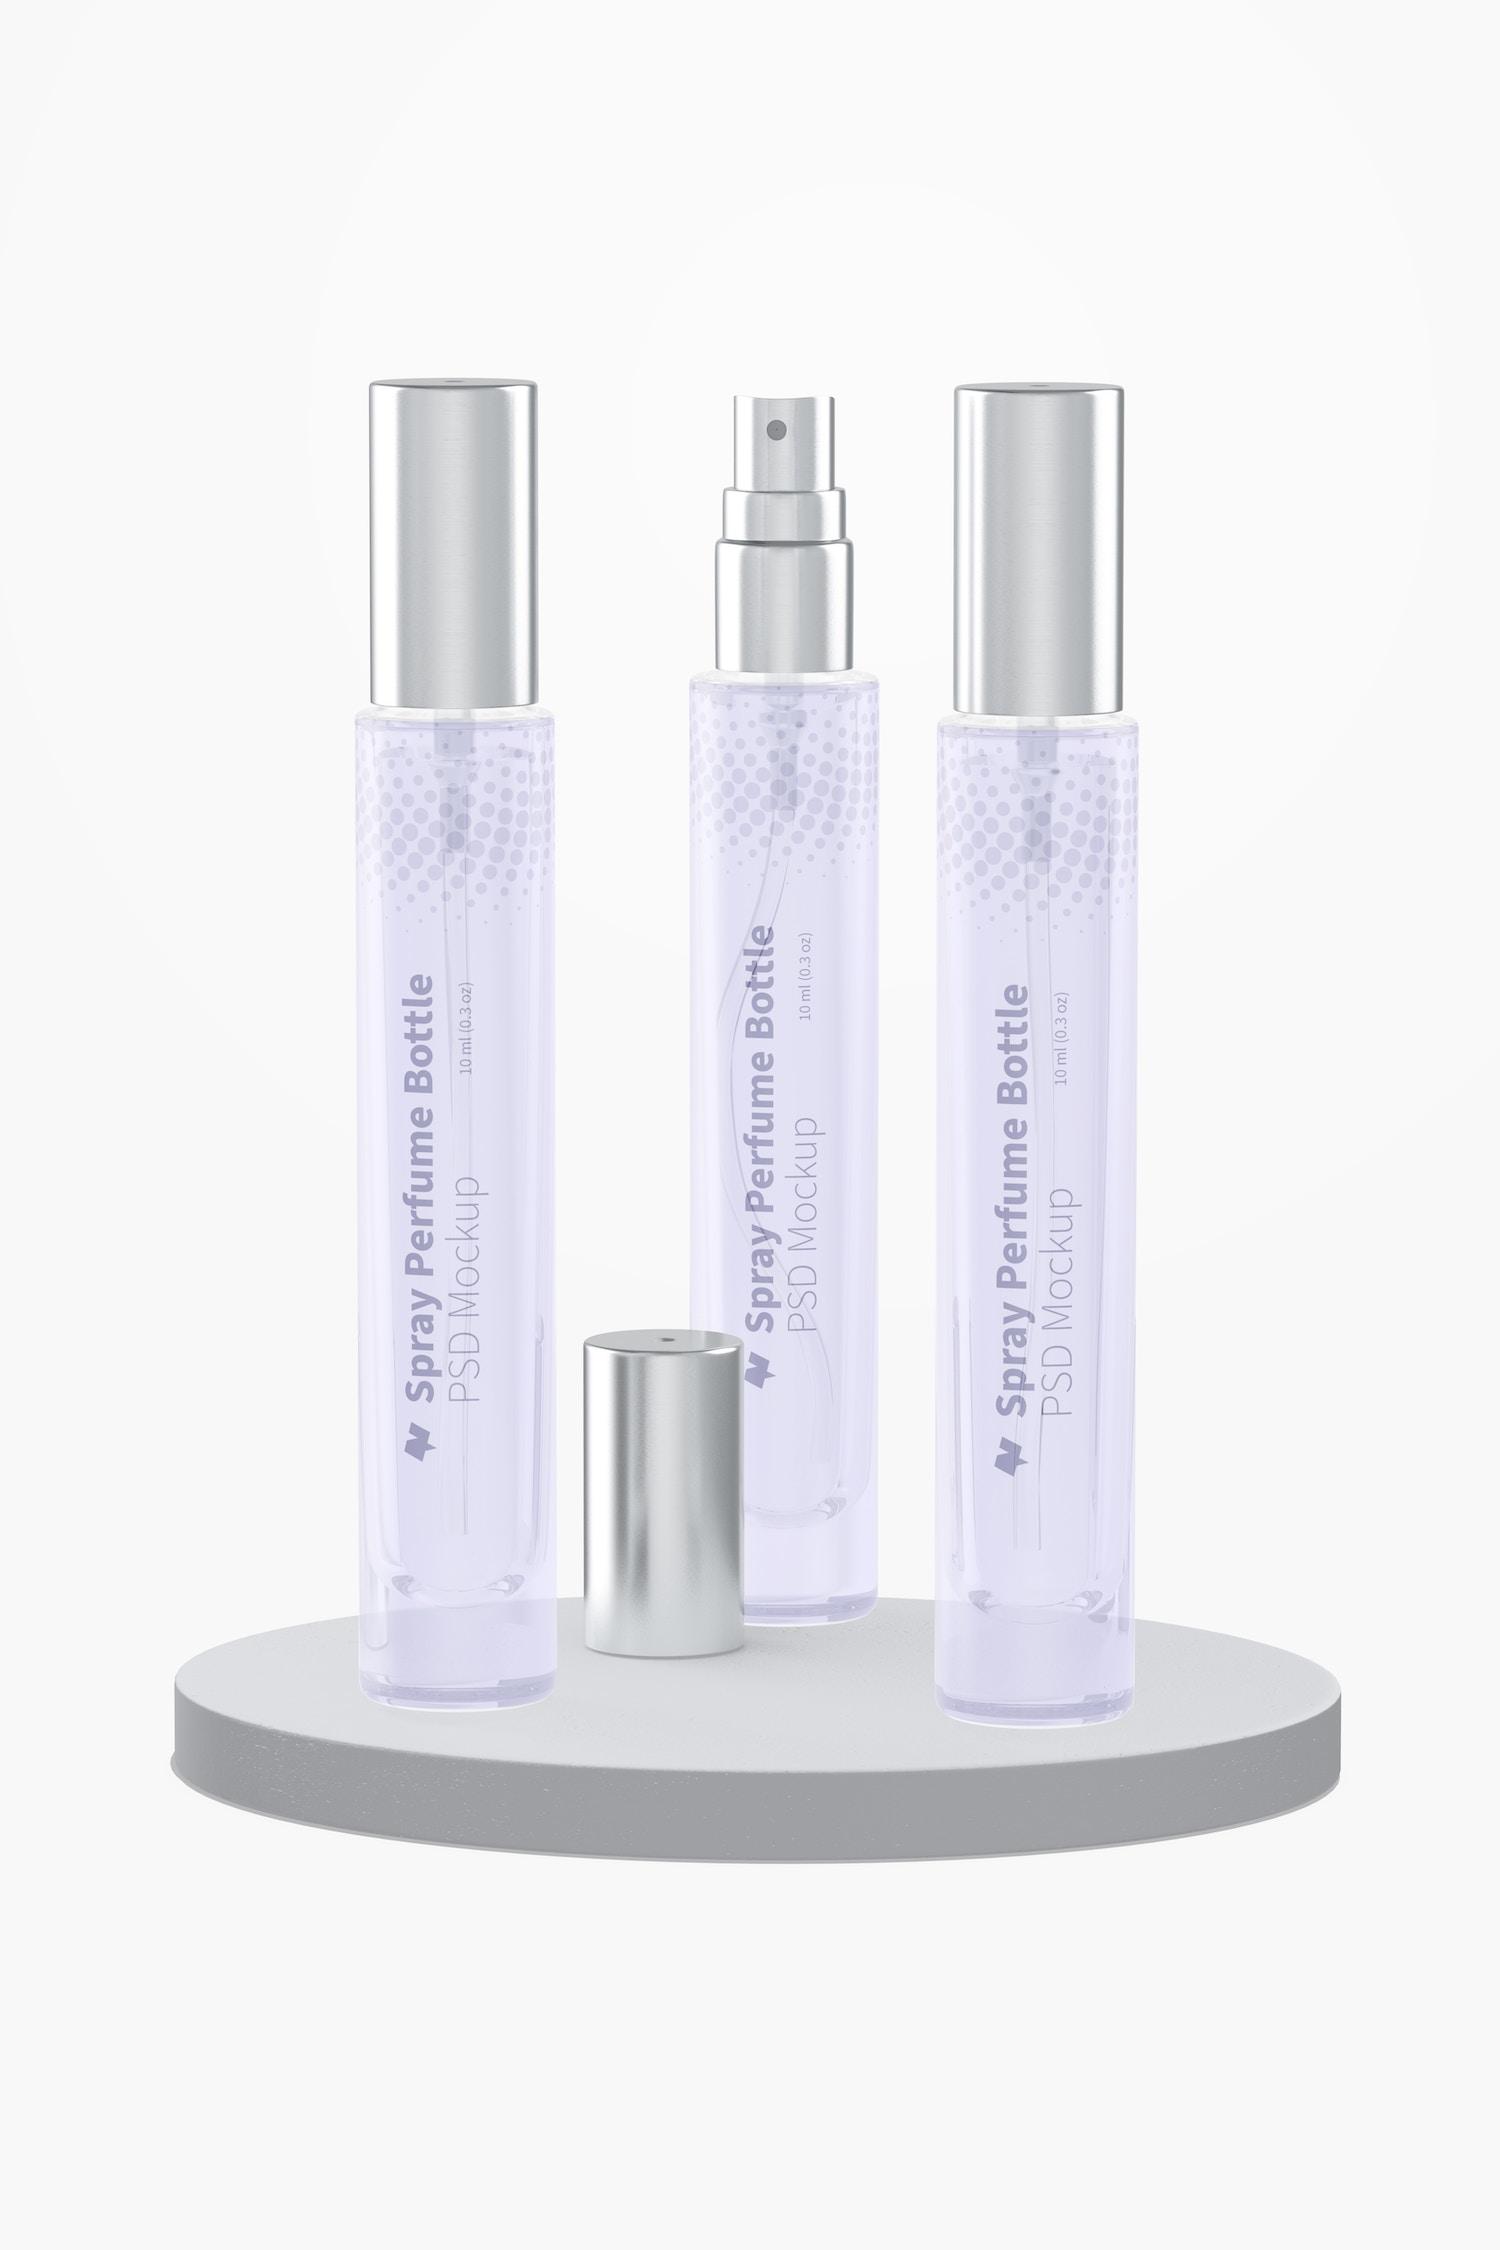 10 ml Spray Perfume Bottle Set Mockup